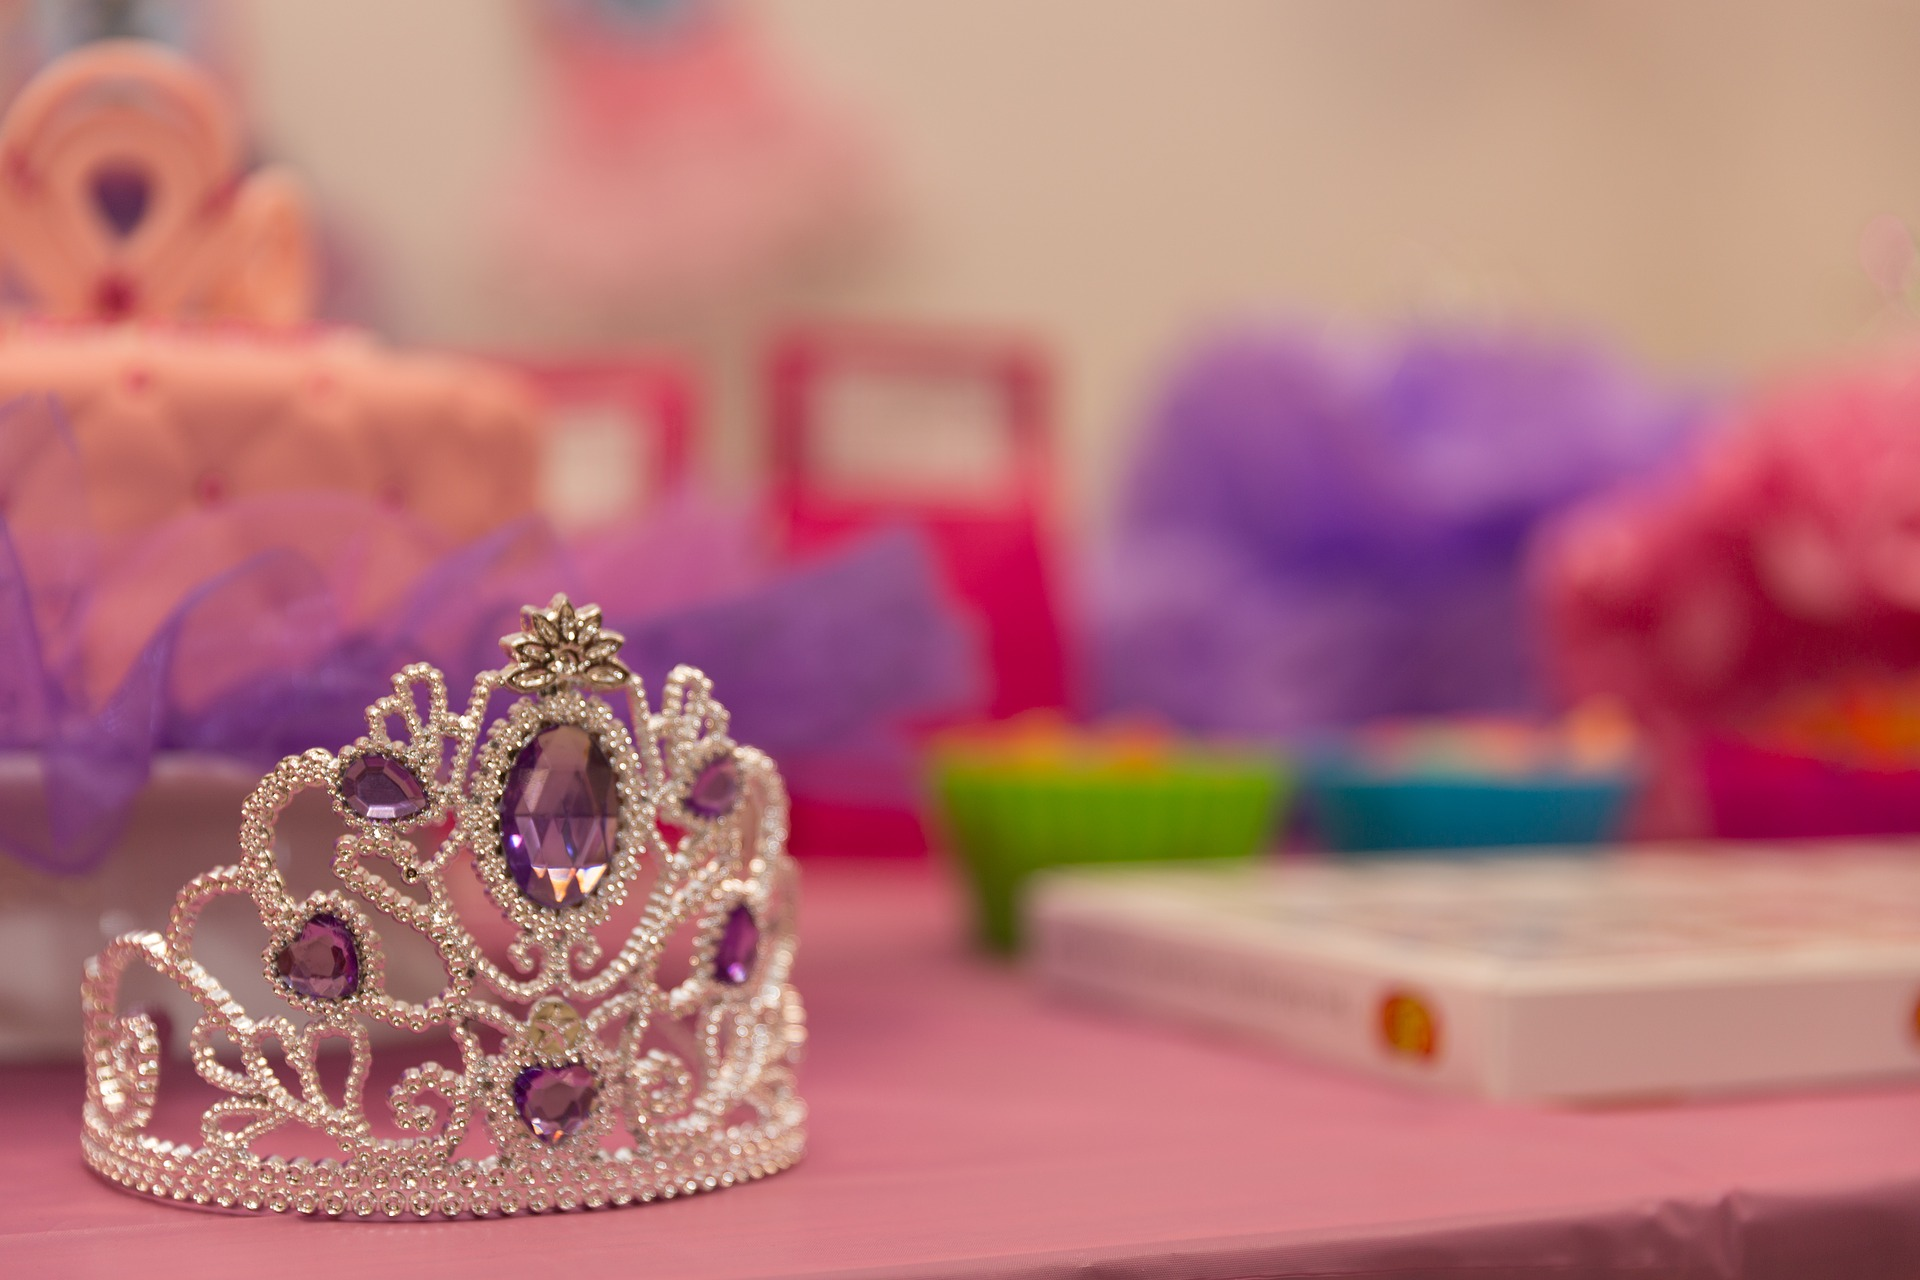 CCLG Little Princess Trust Innovation Grant Open for Application